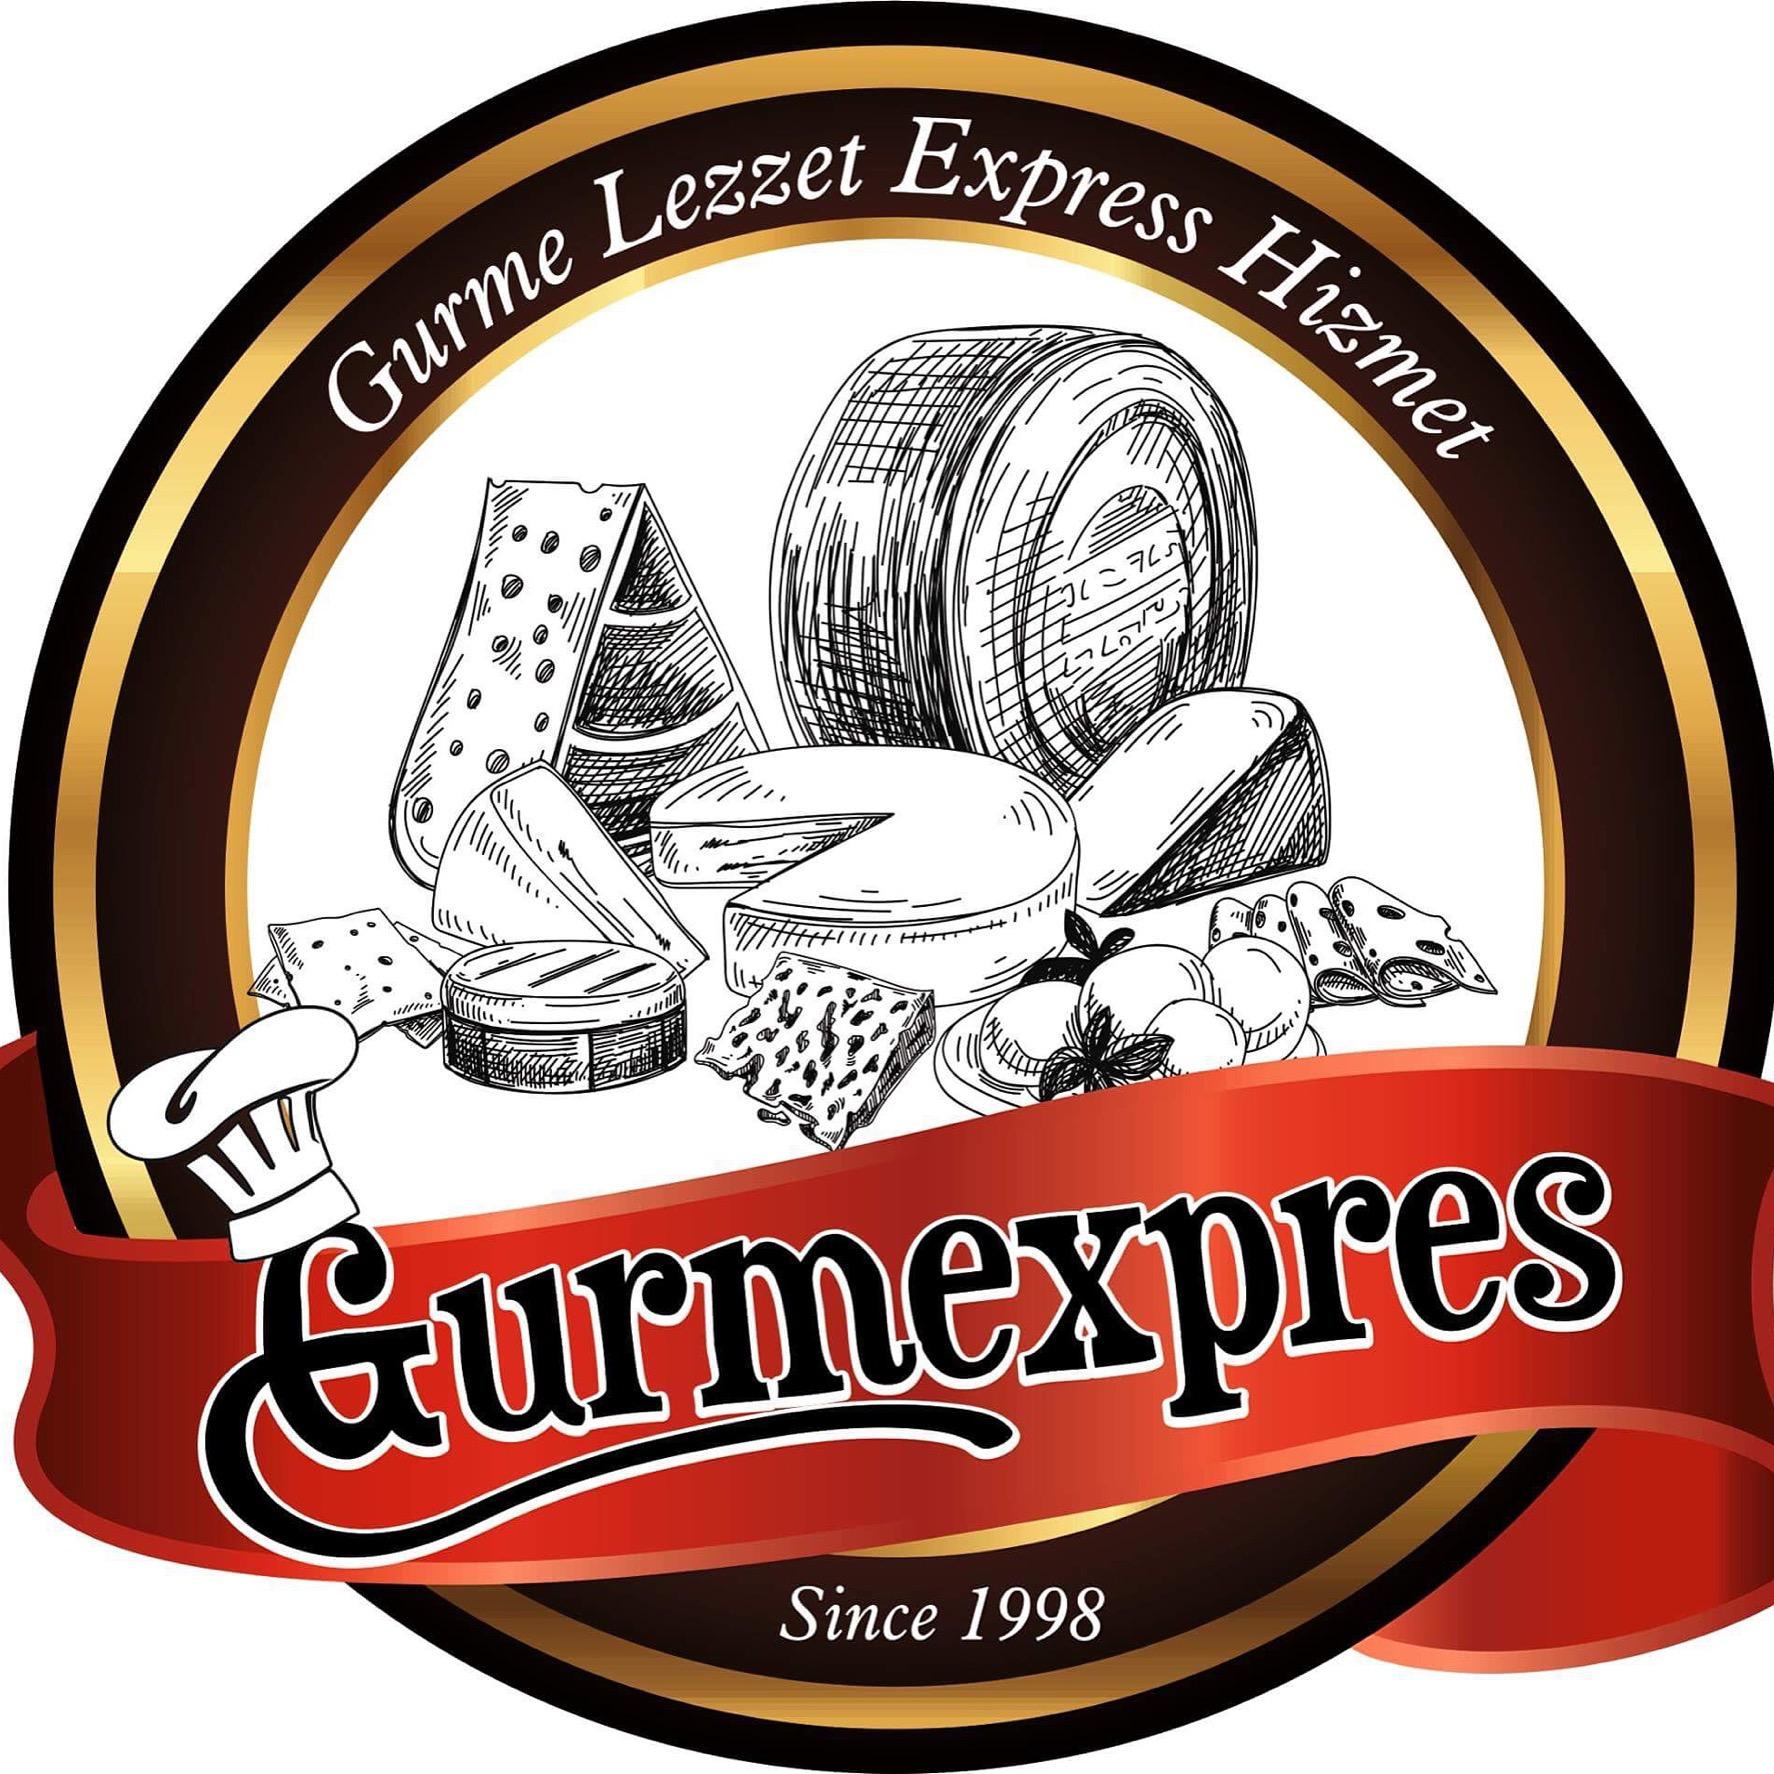 GURMEXPRESS GIDA TOPTAN PERAKENDE LTD. STI.